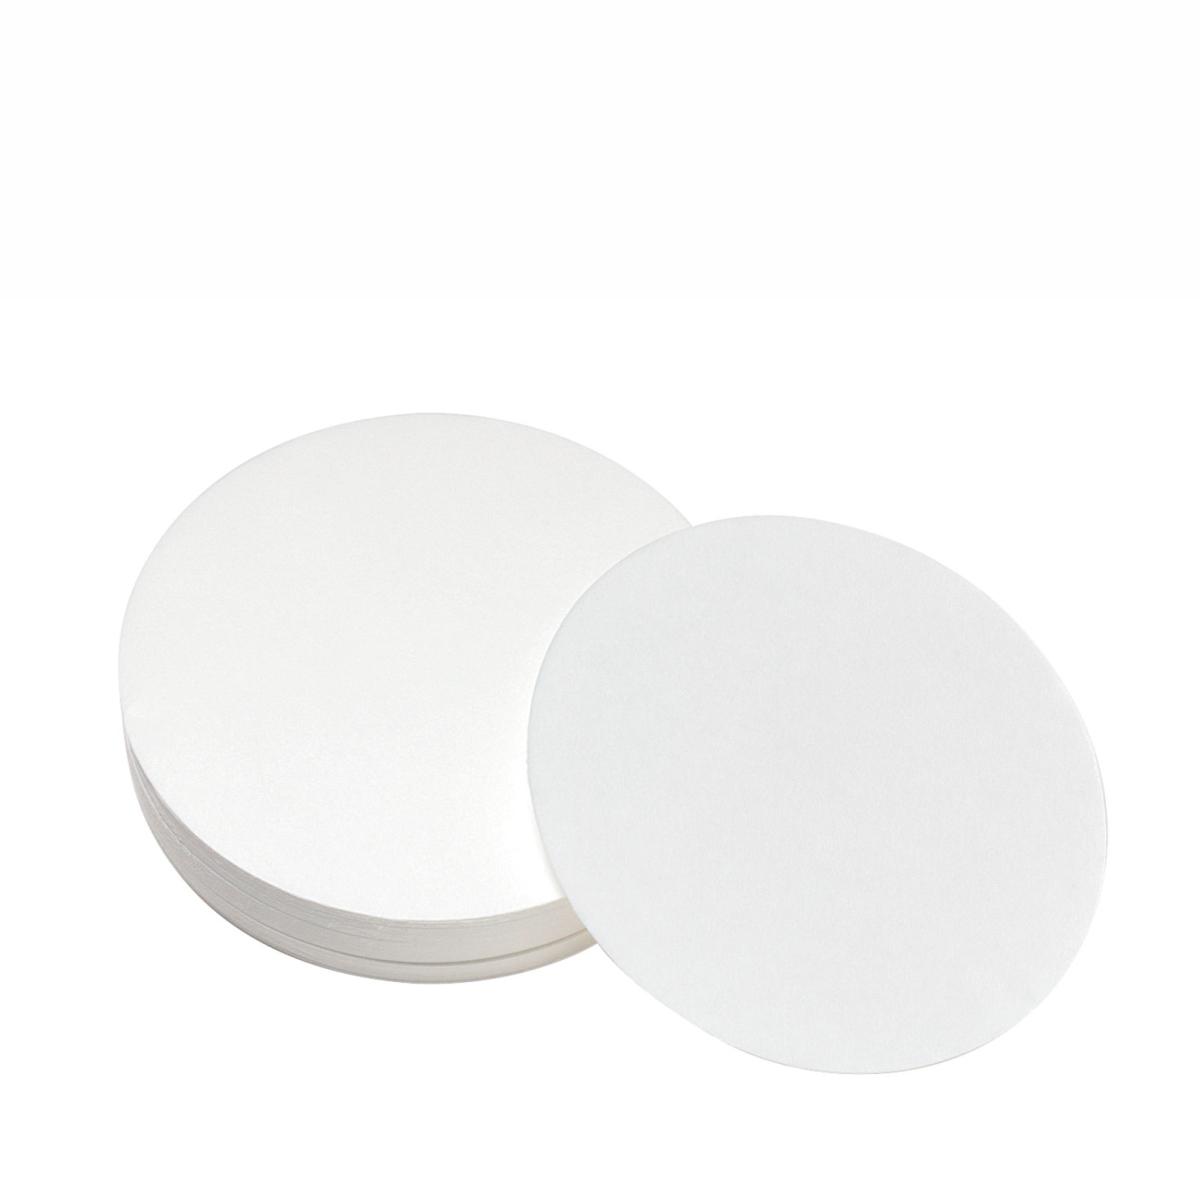 Papel Filtro Tipo Mata Borrão Gramatura 250 g 210 mm (100 unidades)